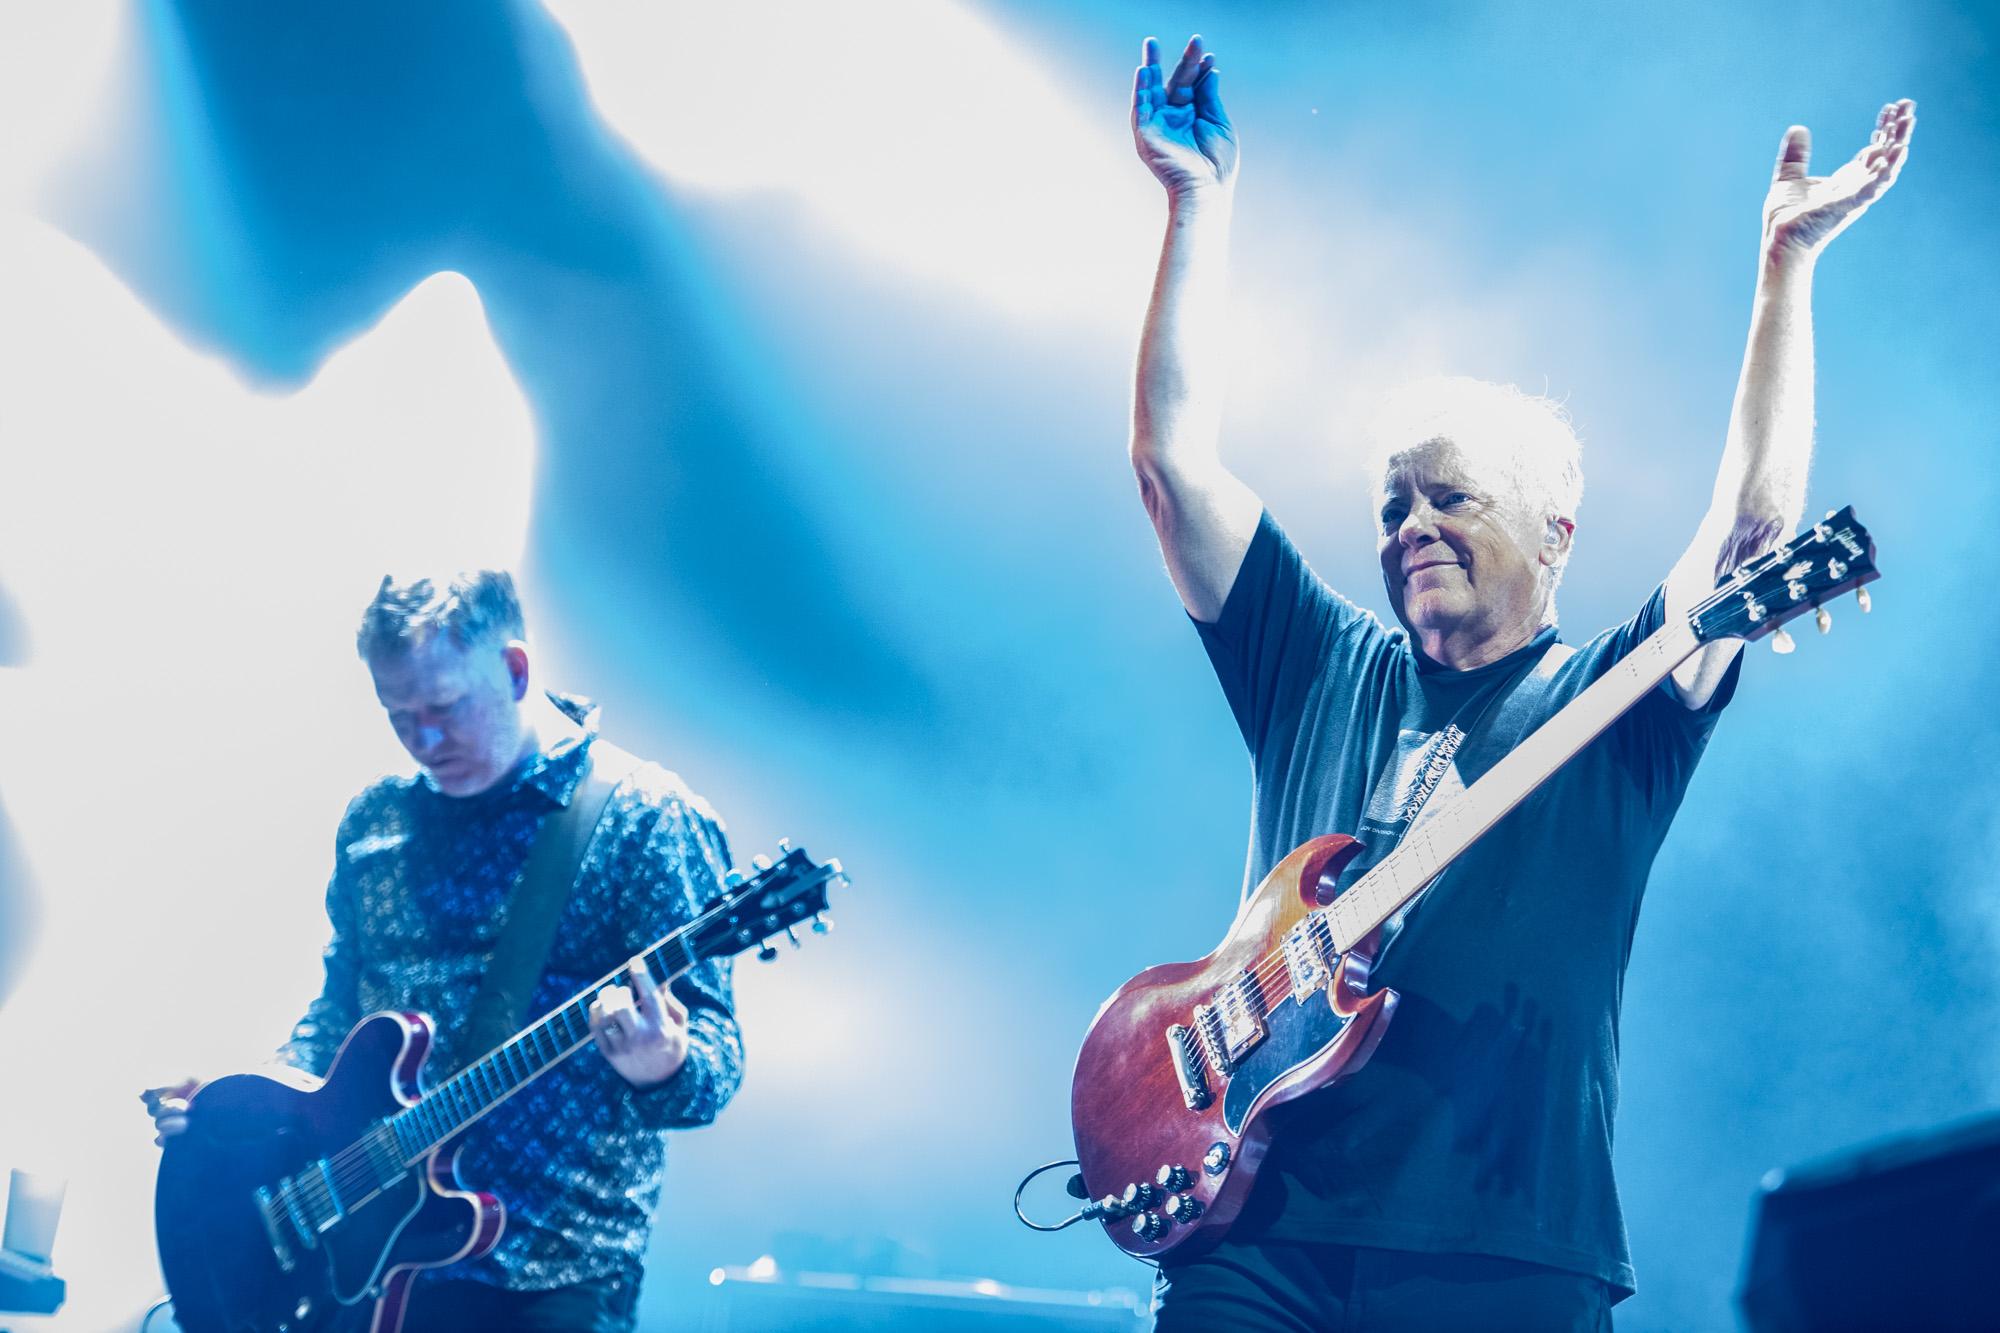 New order @ Rock Werchter 2019 (Nick De Baerdemaeker)